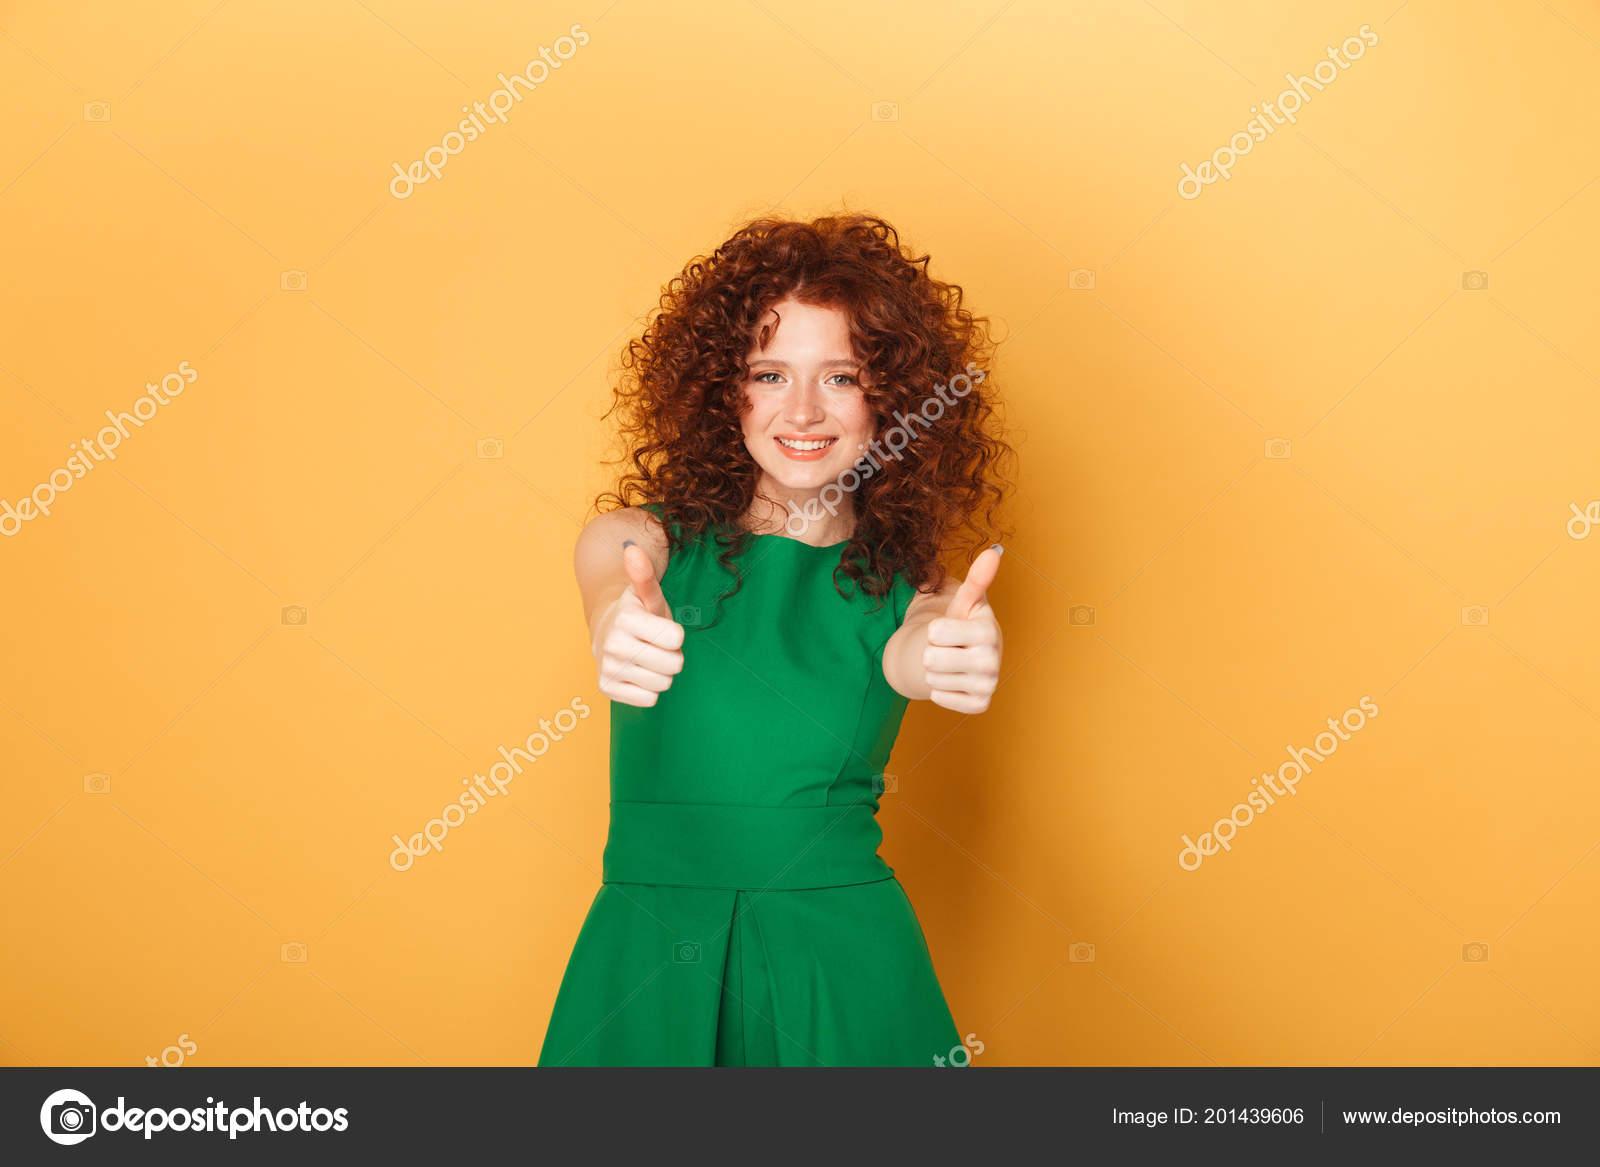 pic Redhead thumbs